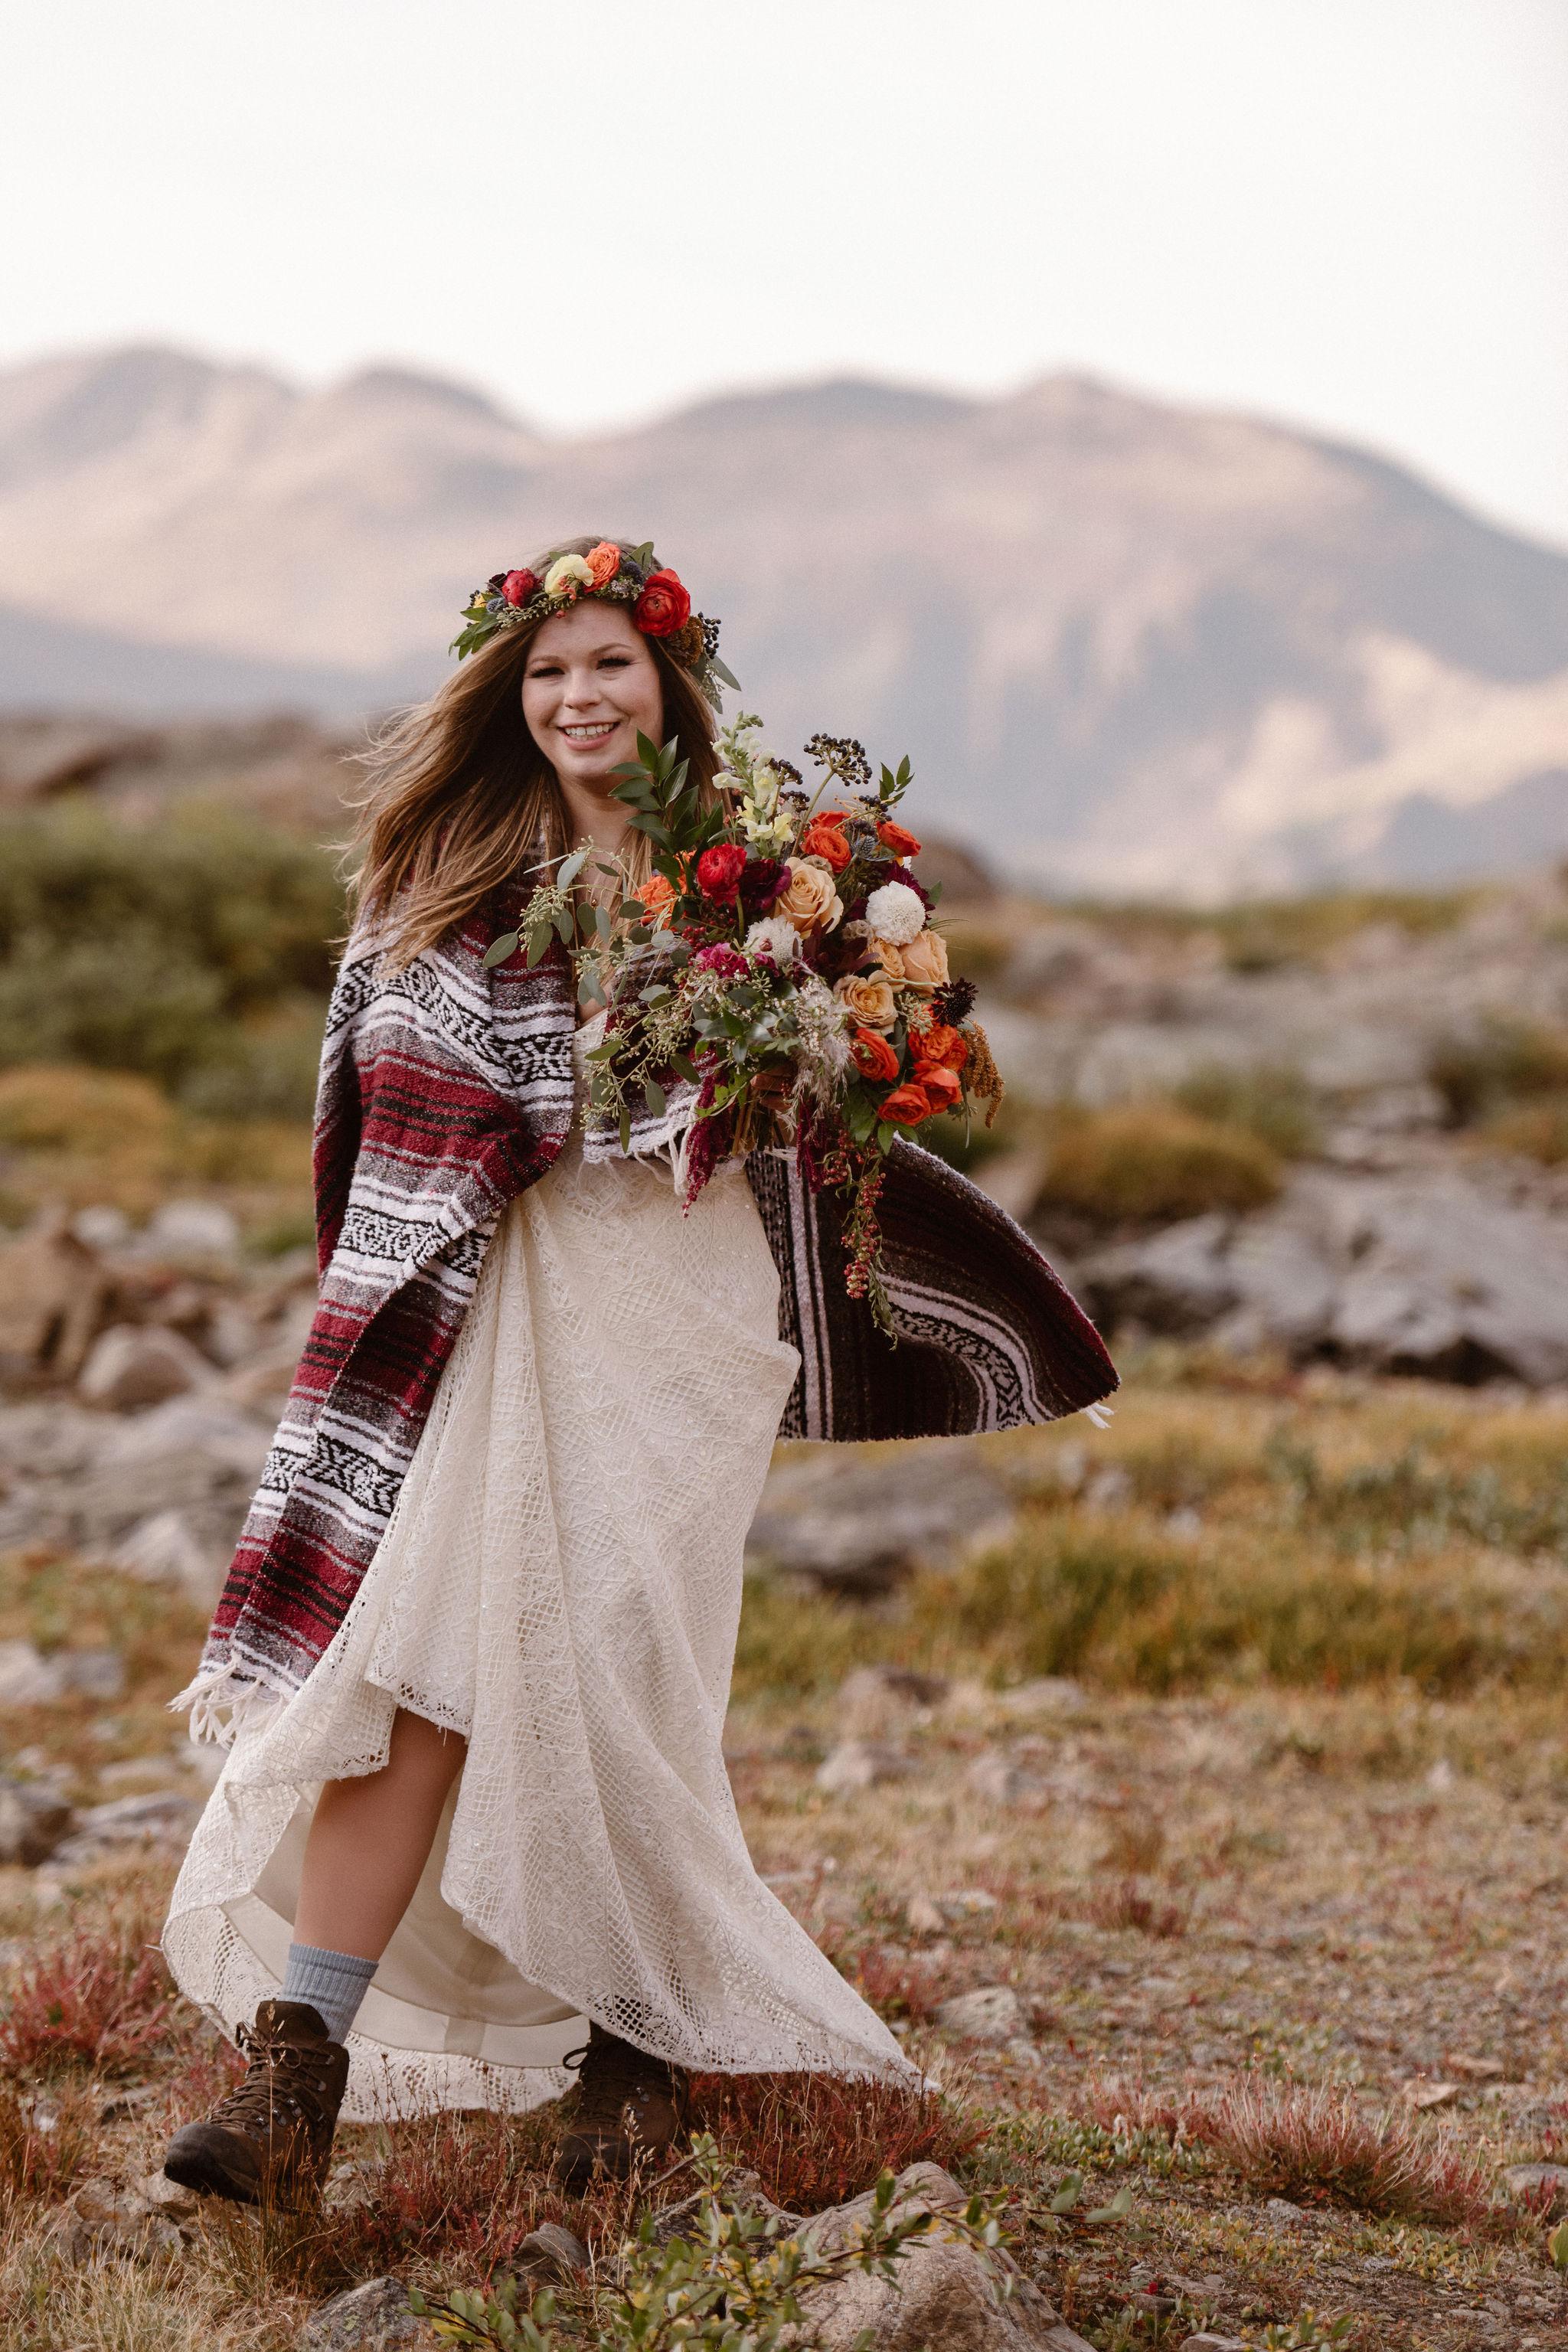 Flowers by Lace and Lilies, bridal bouquet, wedding bouquet, elopement, colorado wedding, colorado elopement